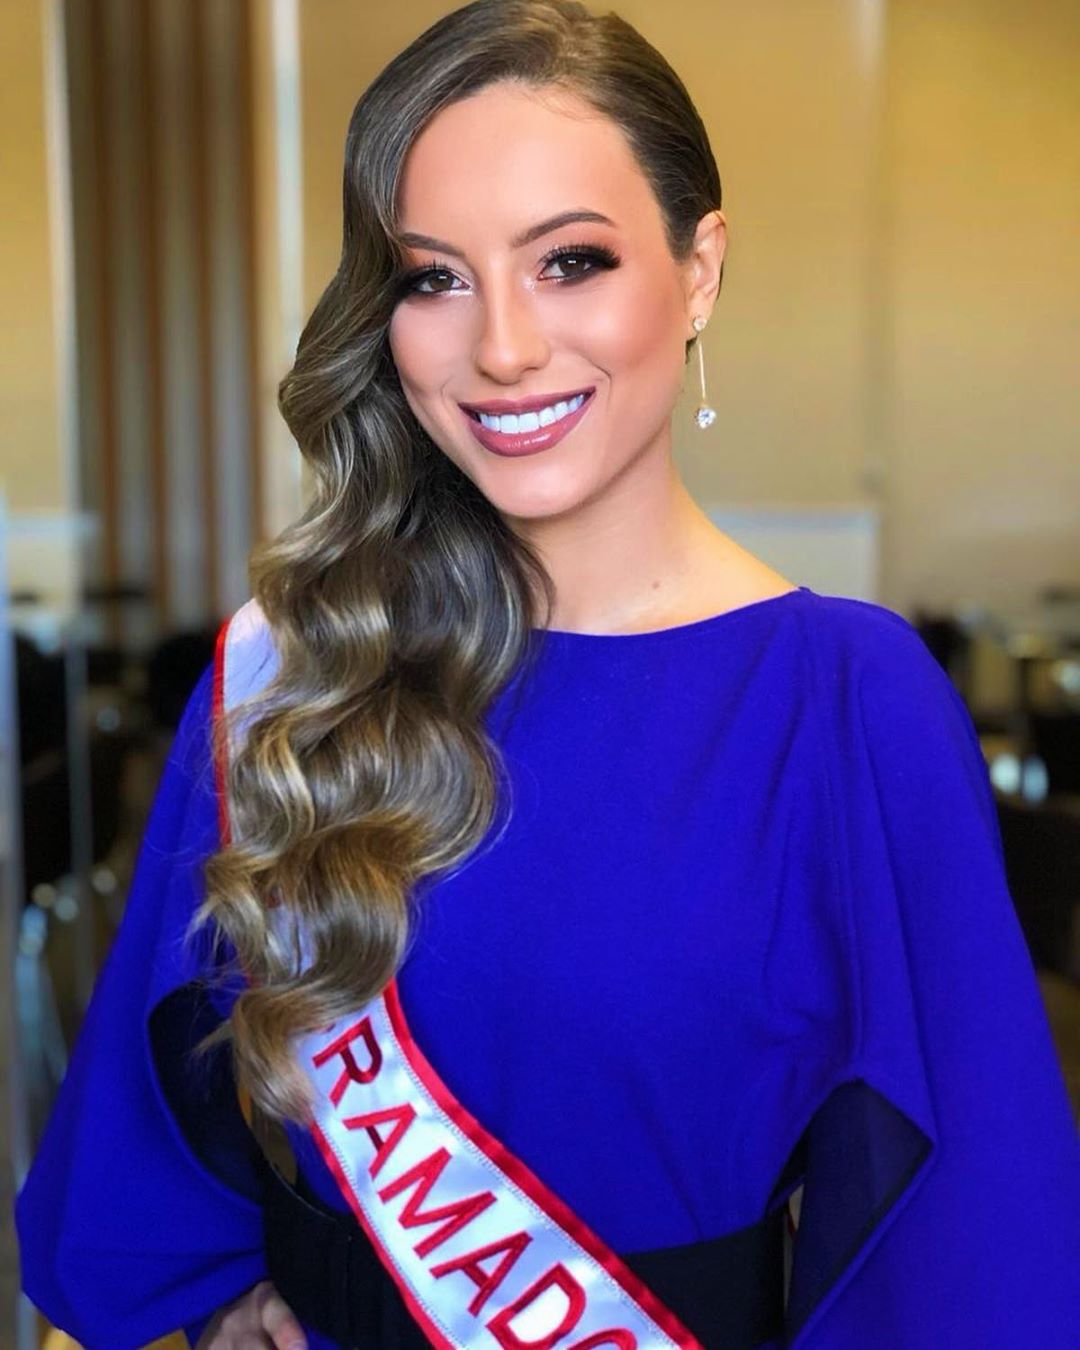 cristine boff sartor, segunda finalista de miss latinoamerica 2019. - Página 5 65315410